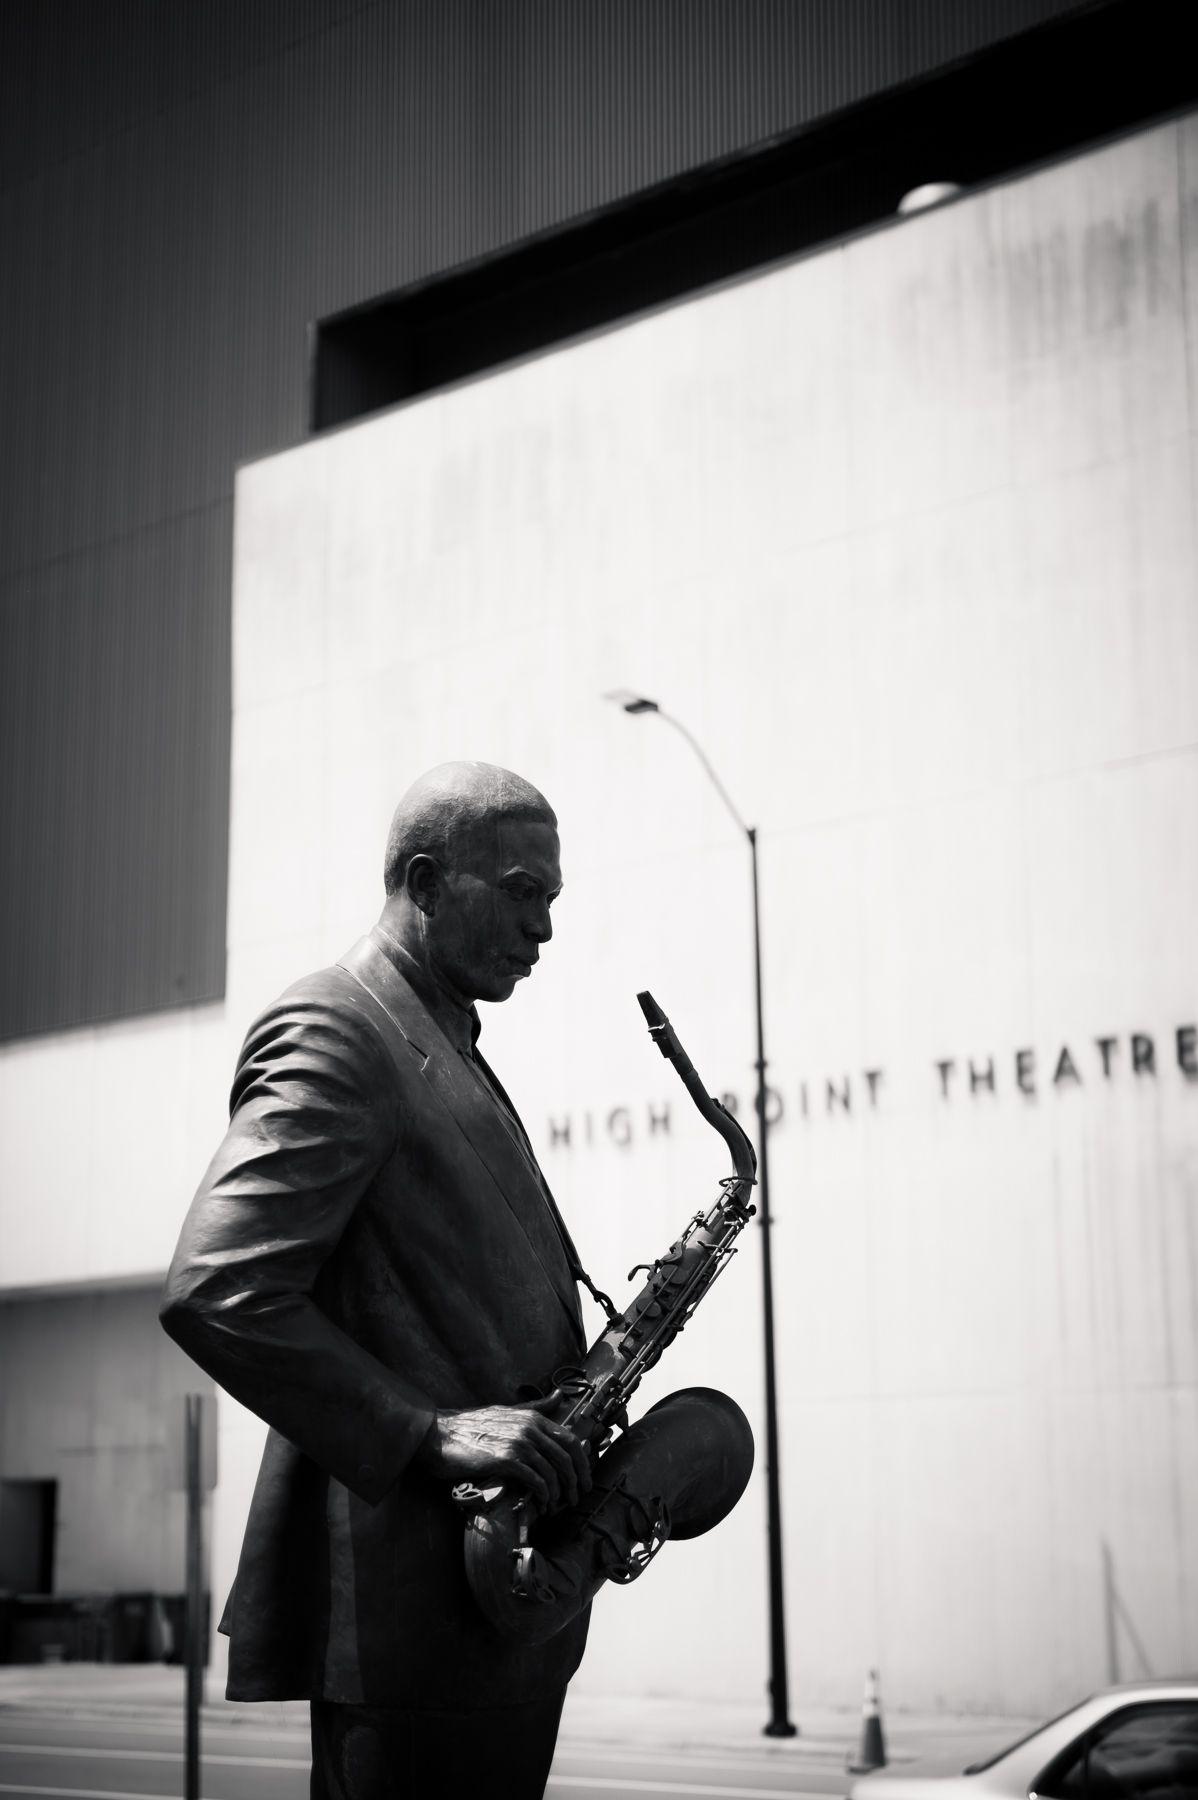 John Coltrane statue in High Point, NC.